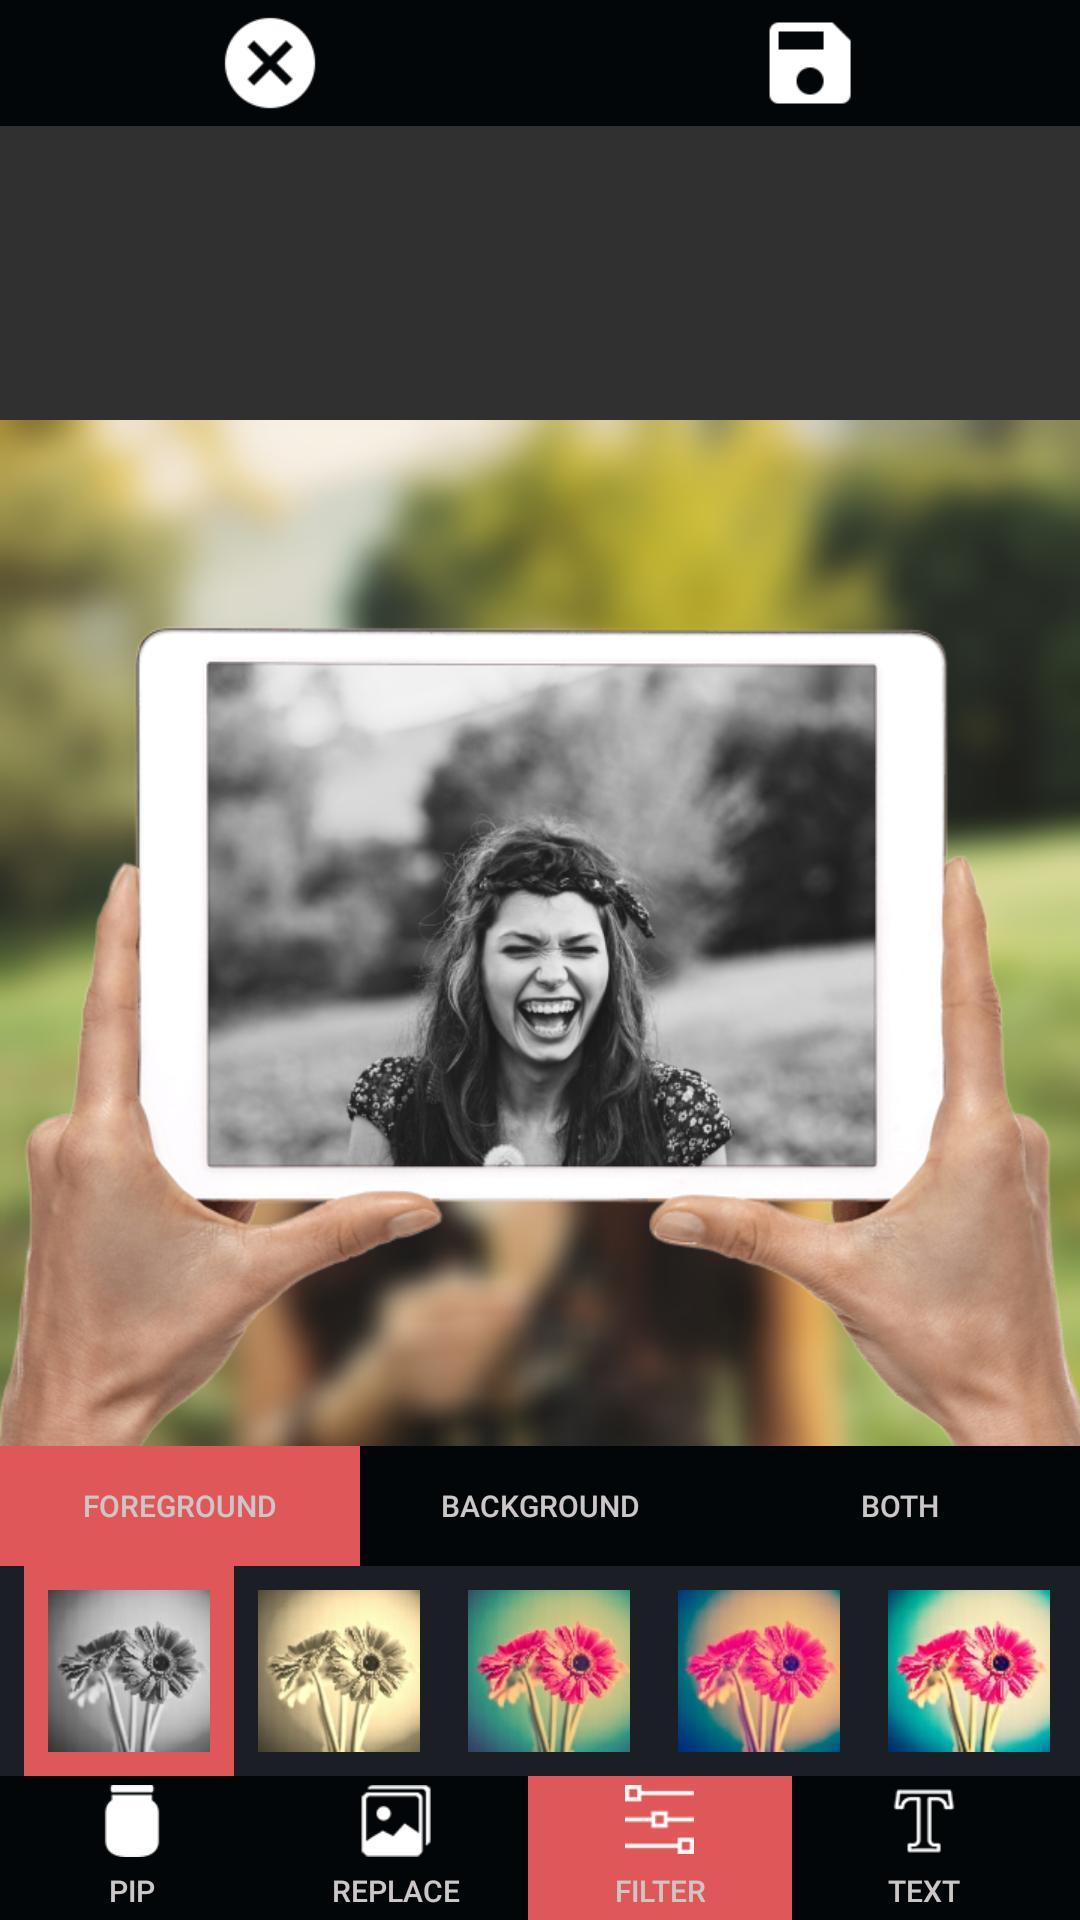 Selfie Camera Editor: Take Selfies & Edit Photos 2.2.2 Screenshot 10